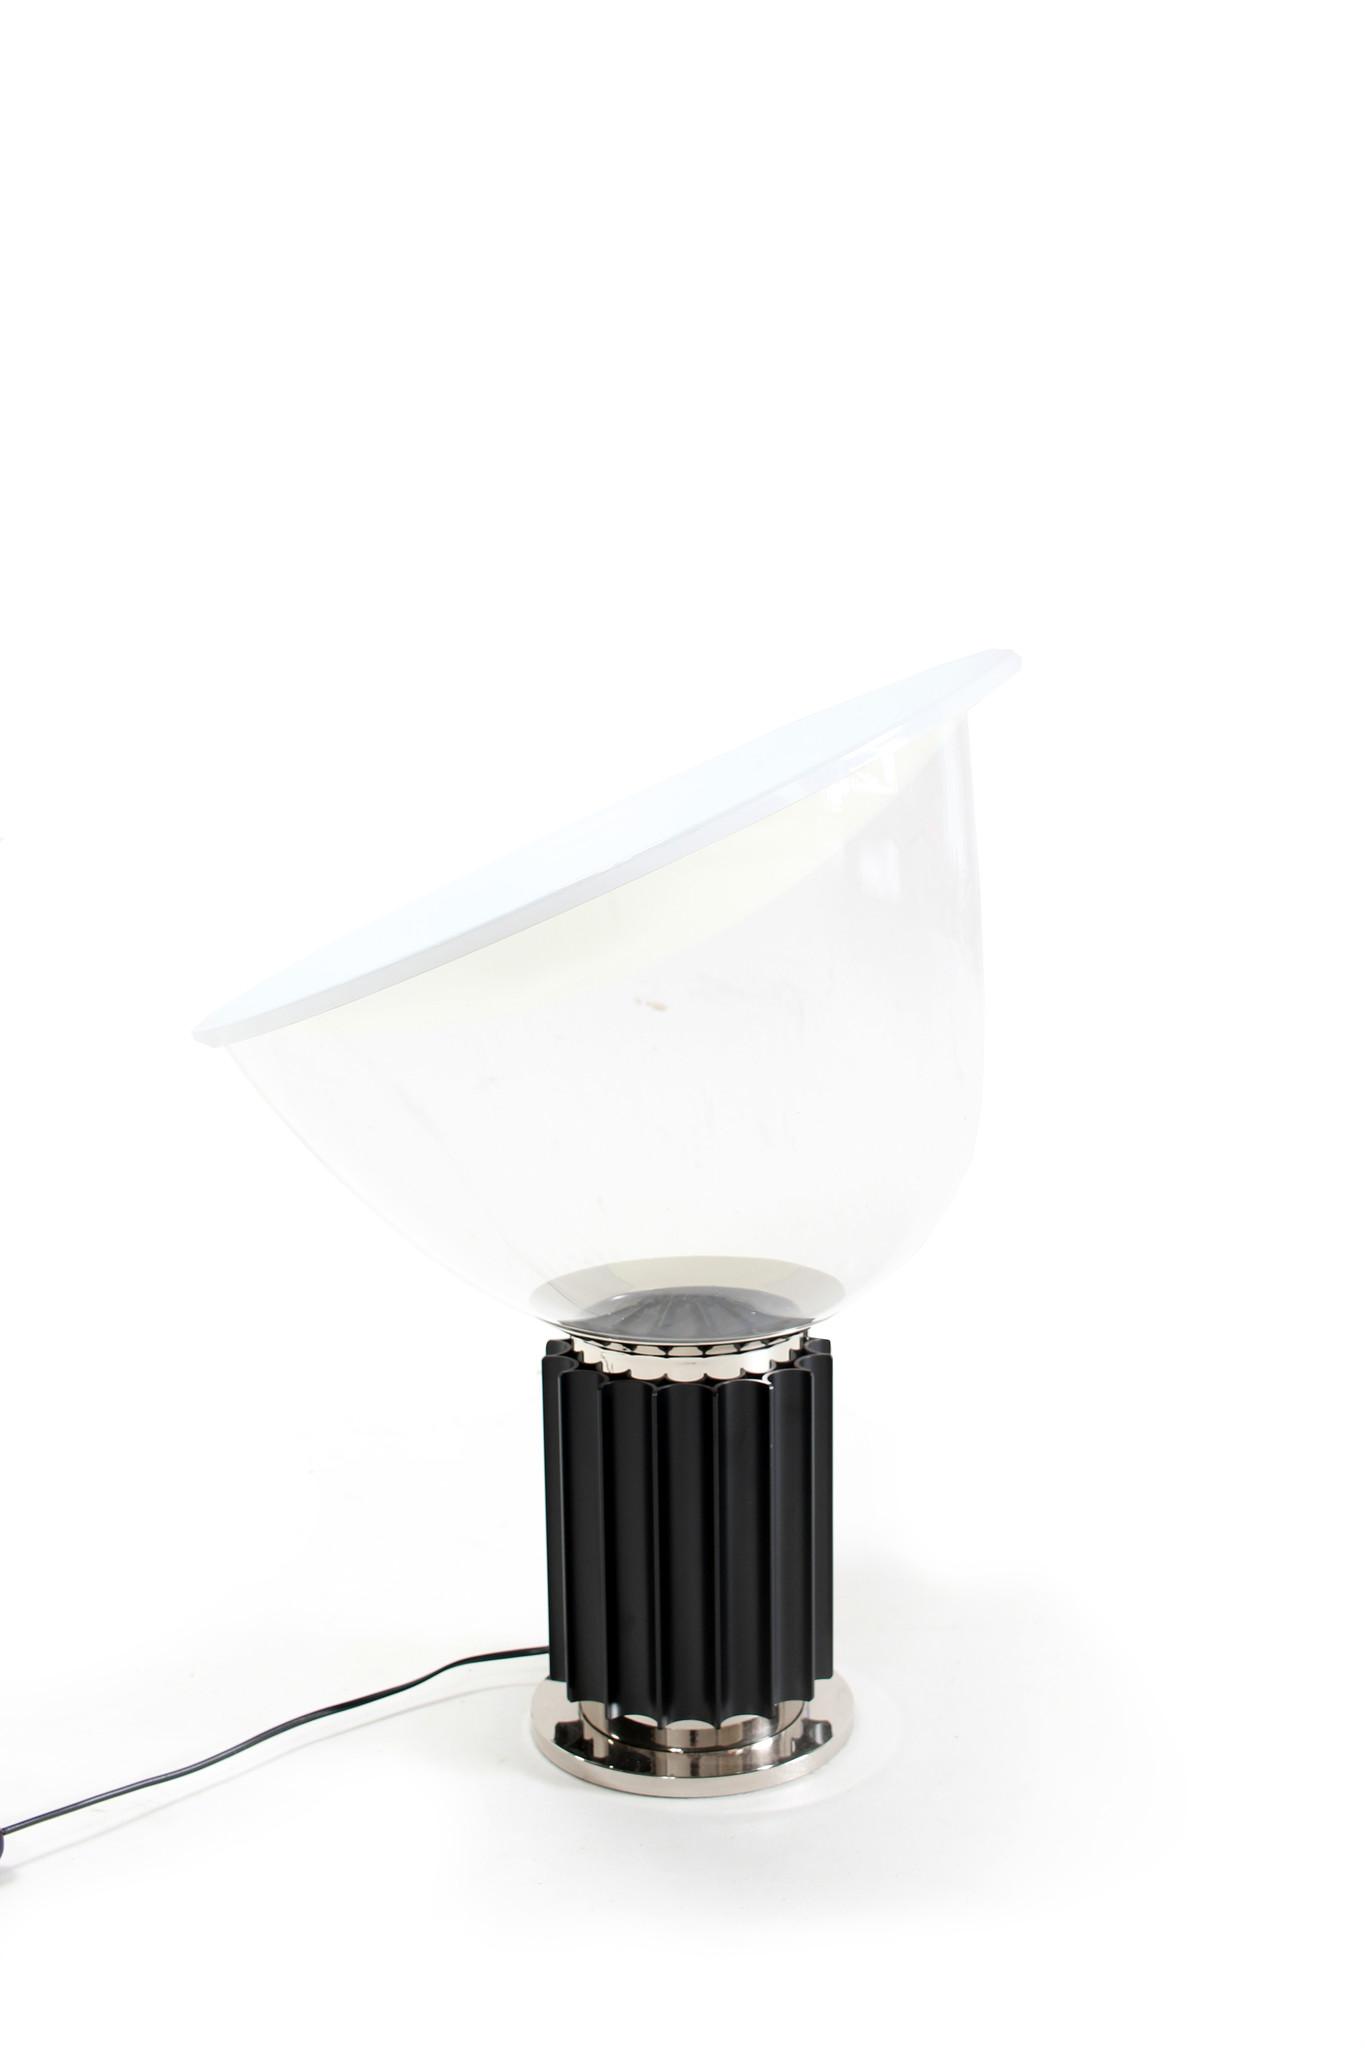 Flos tafellamp Taccia met glazen kap